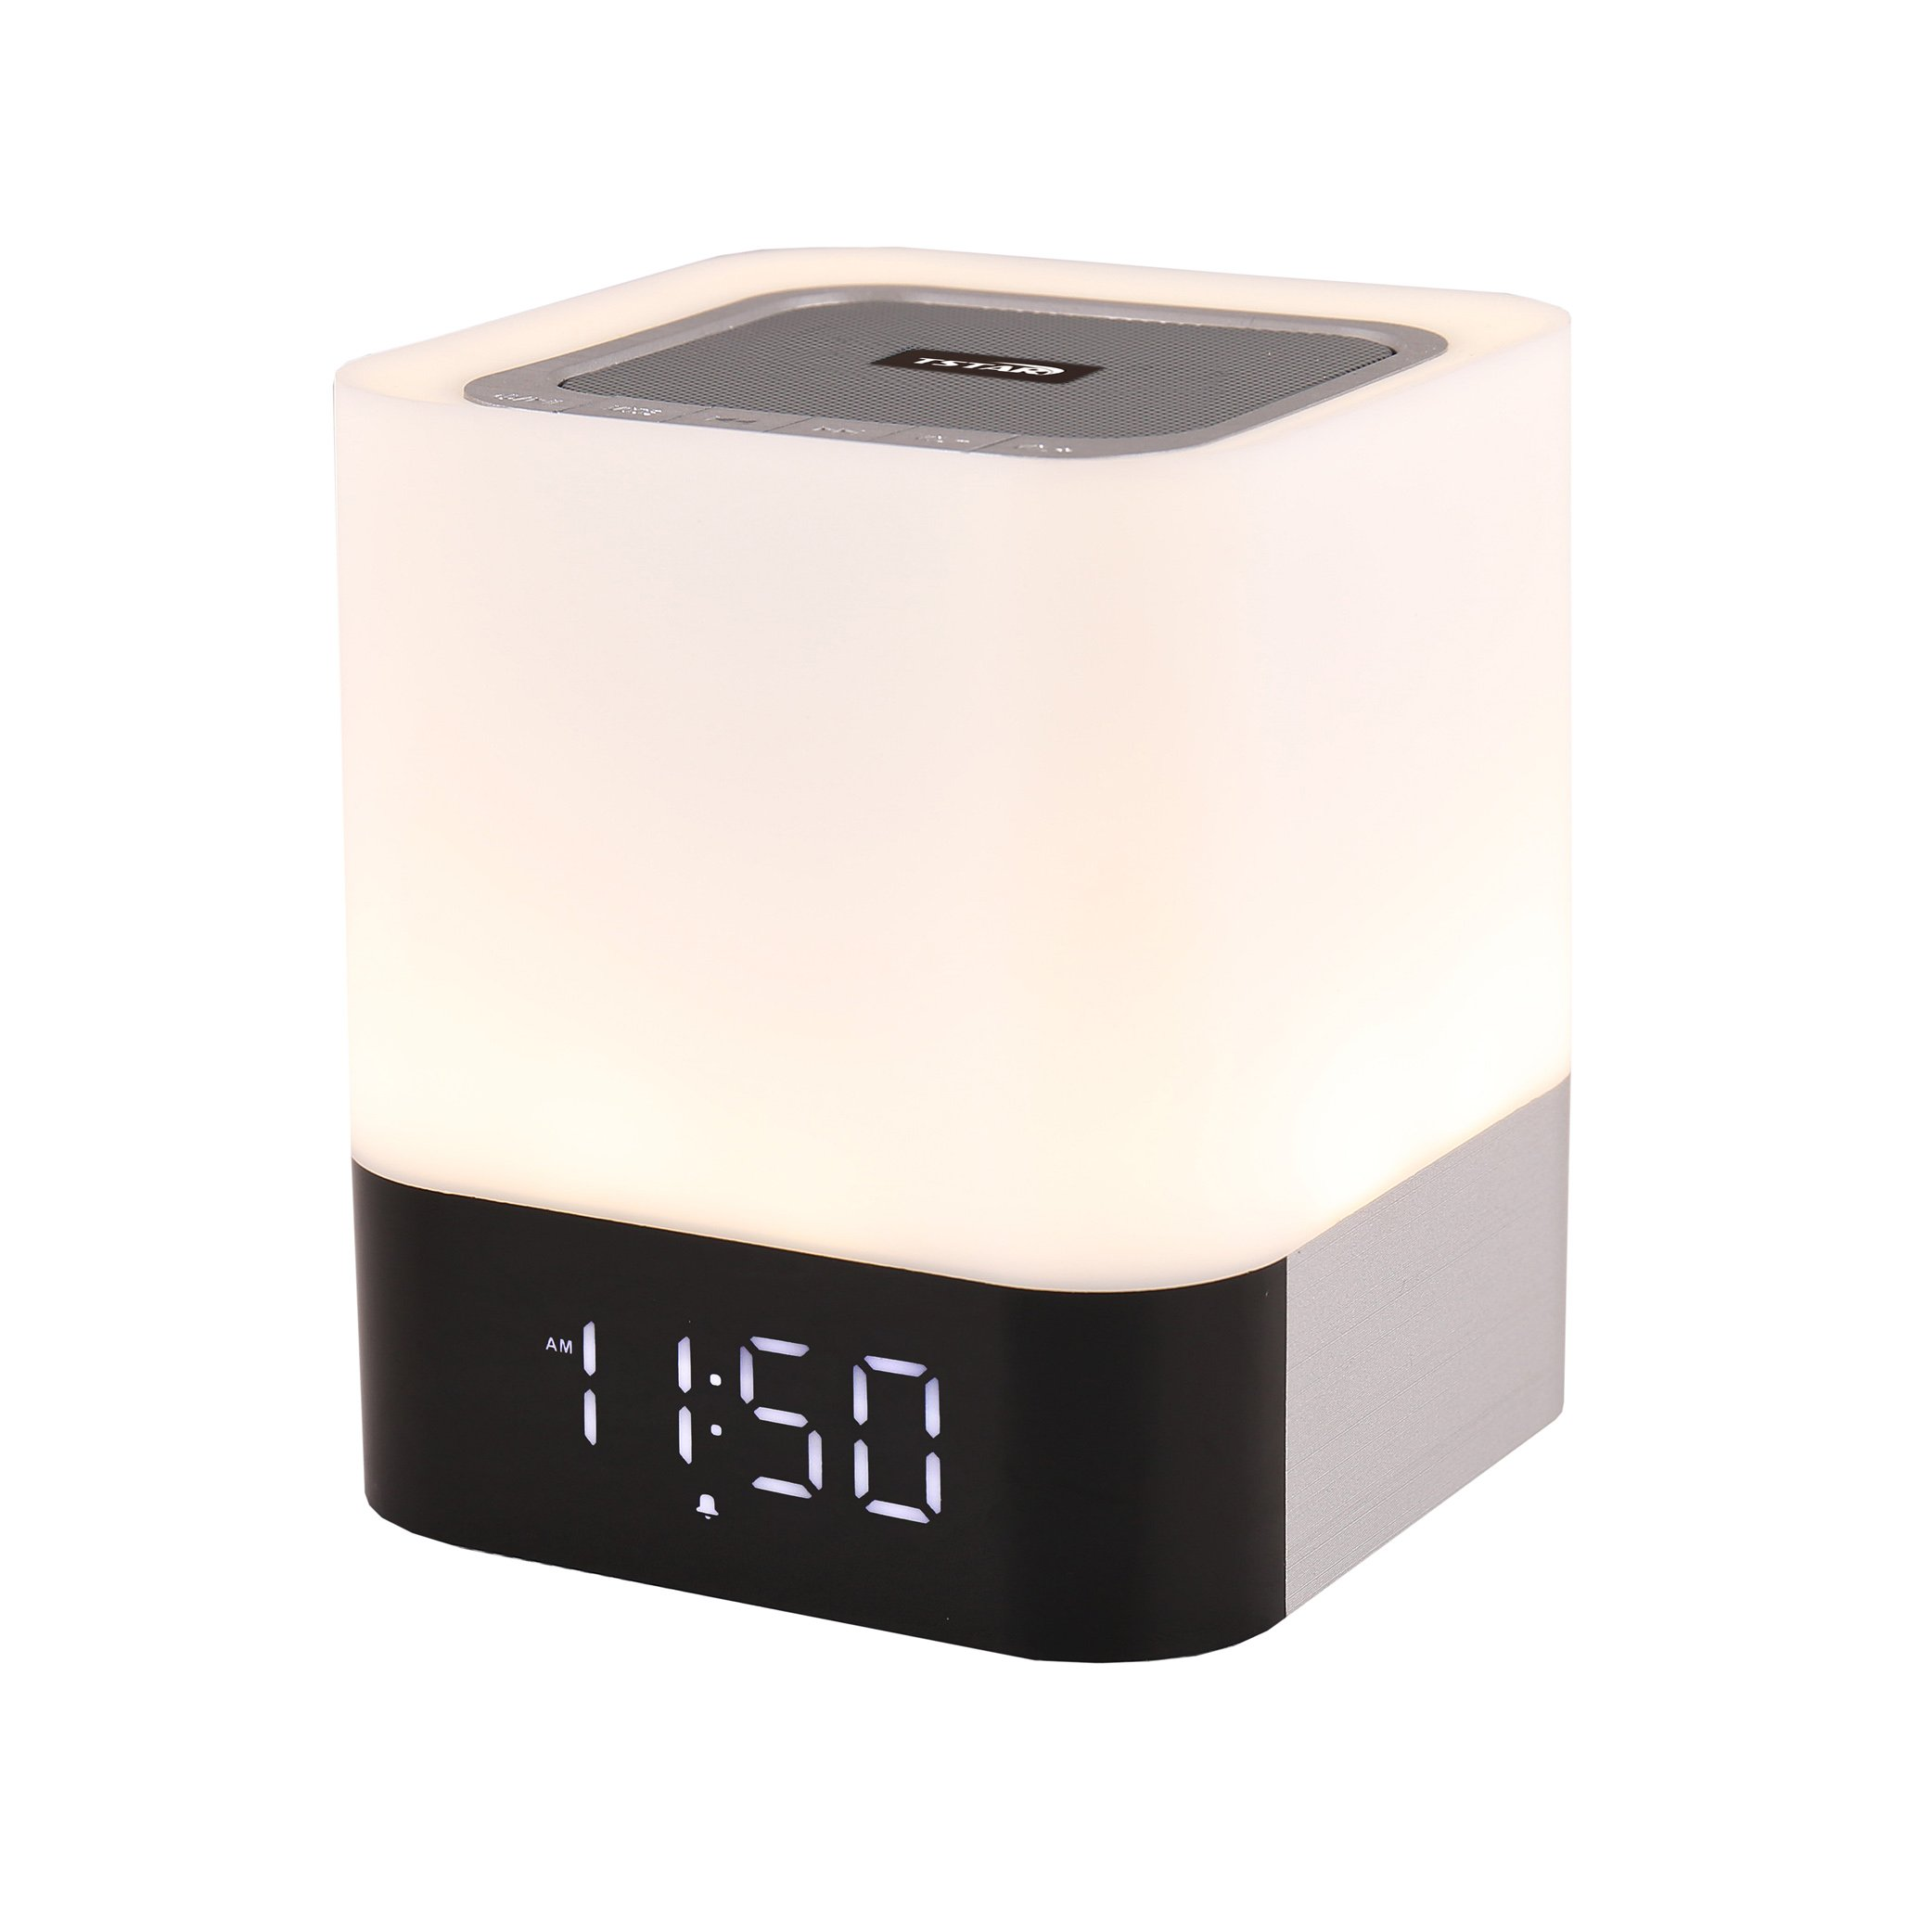 Tstar Wireless Bluetooth 0612957968755